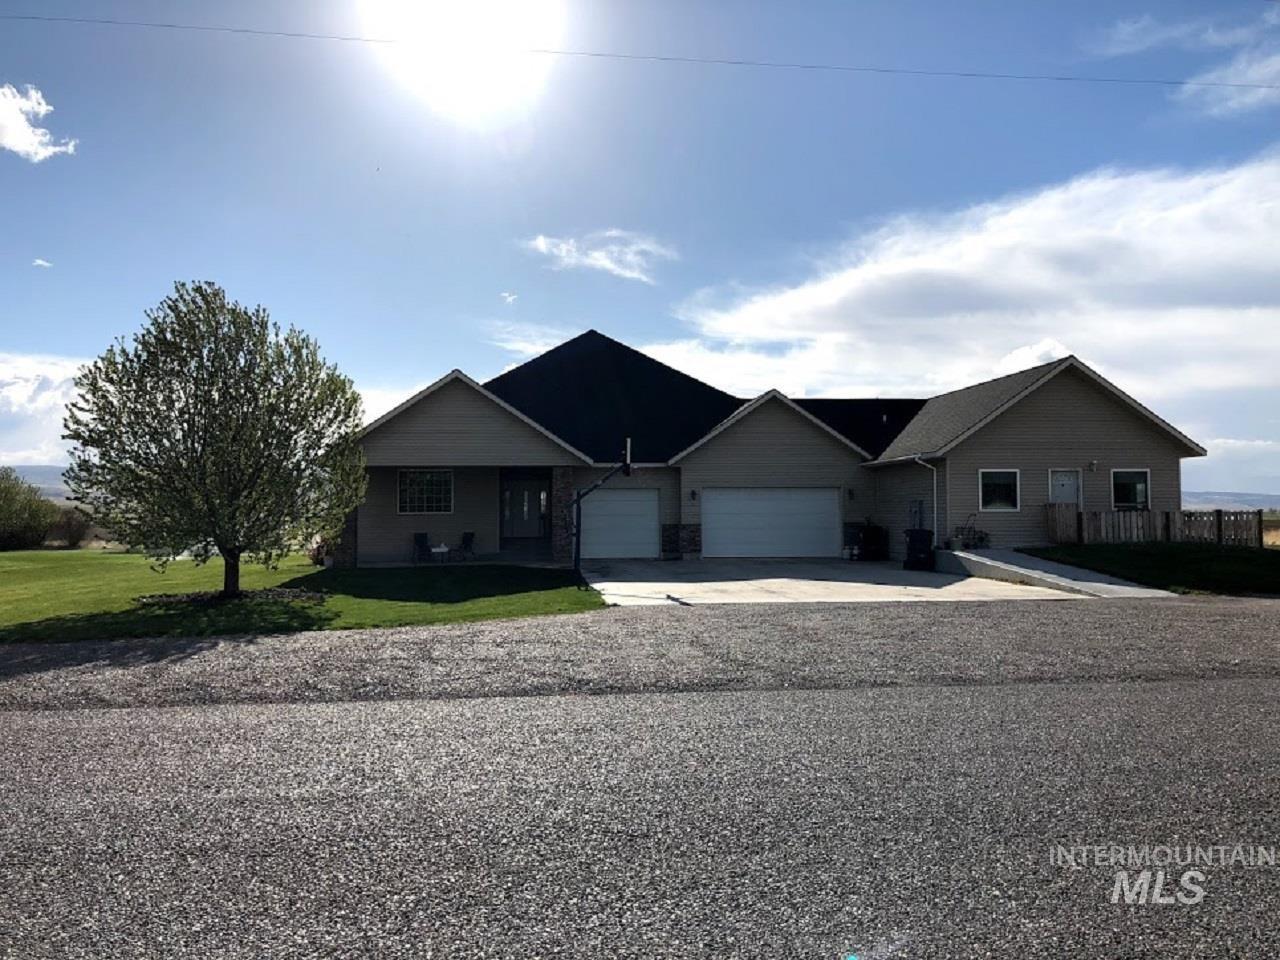 435 S College Property Photo